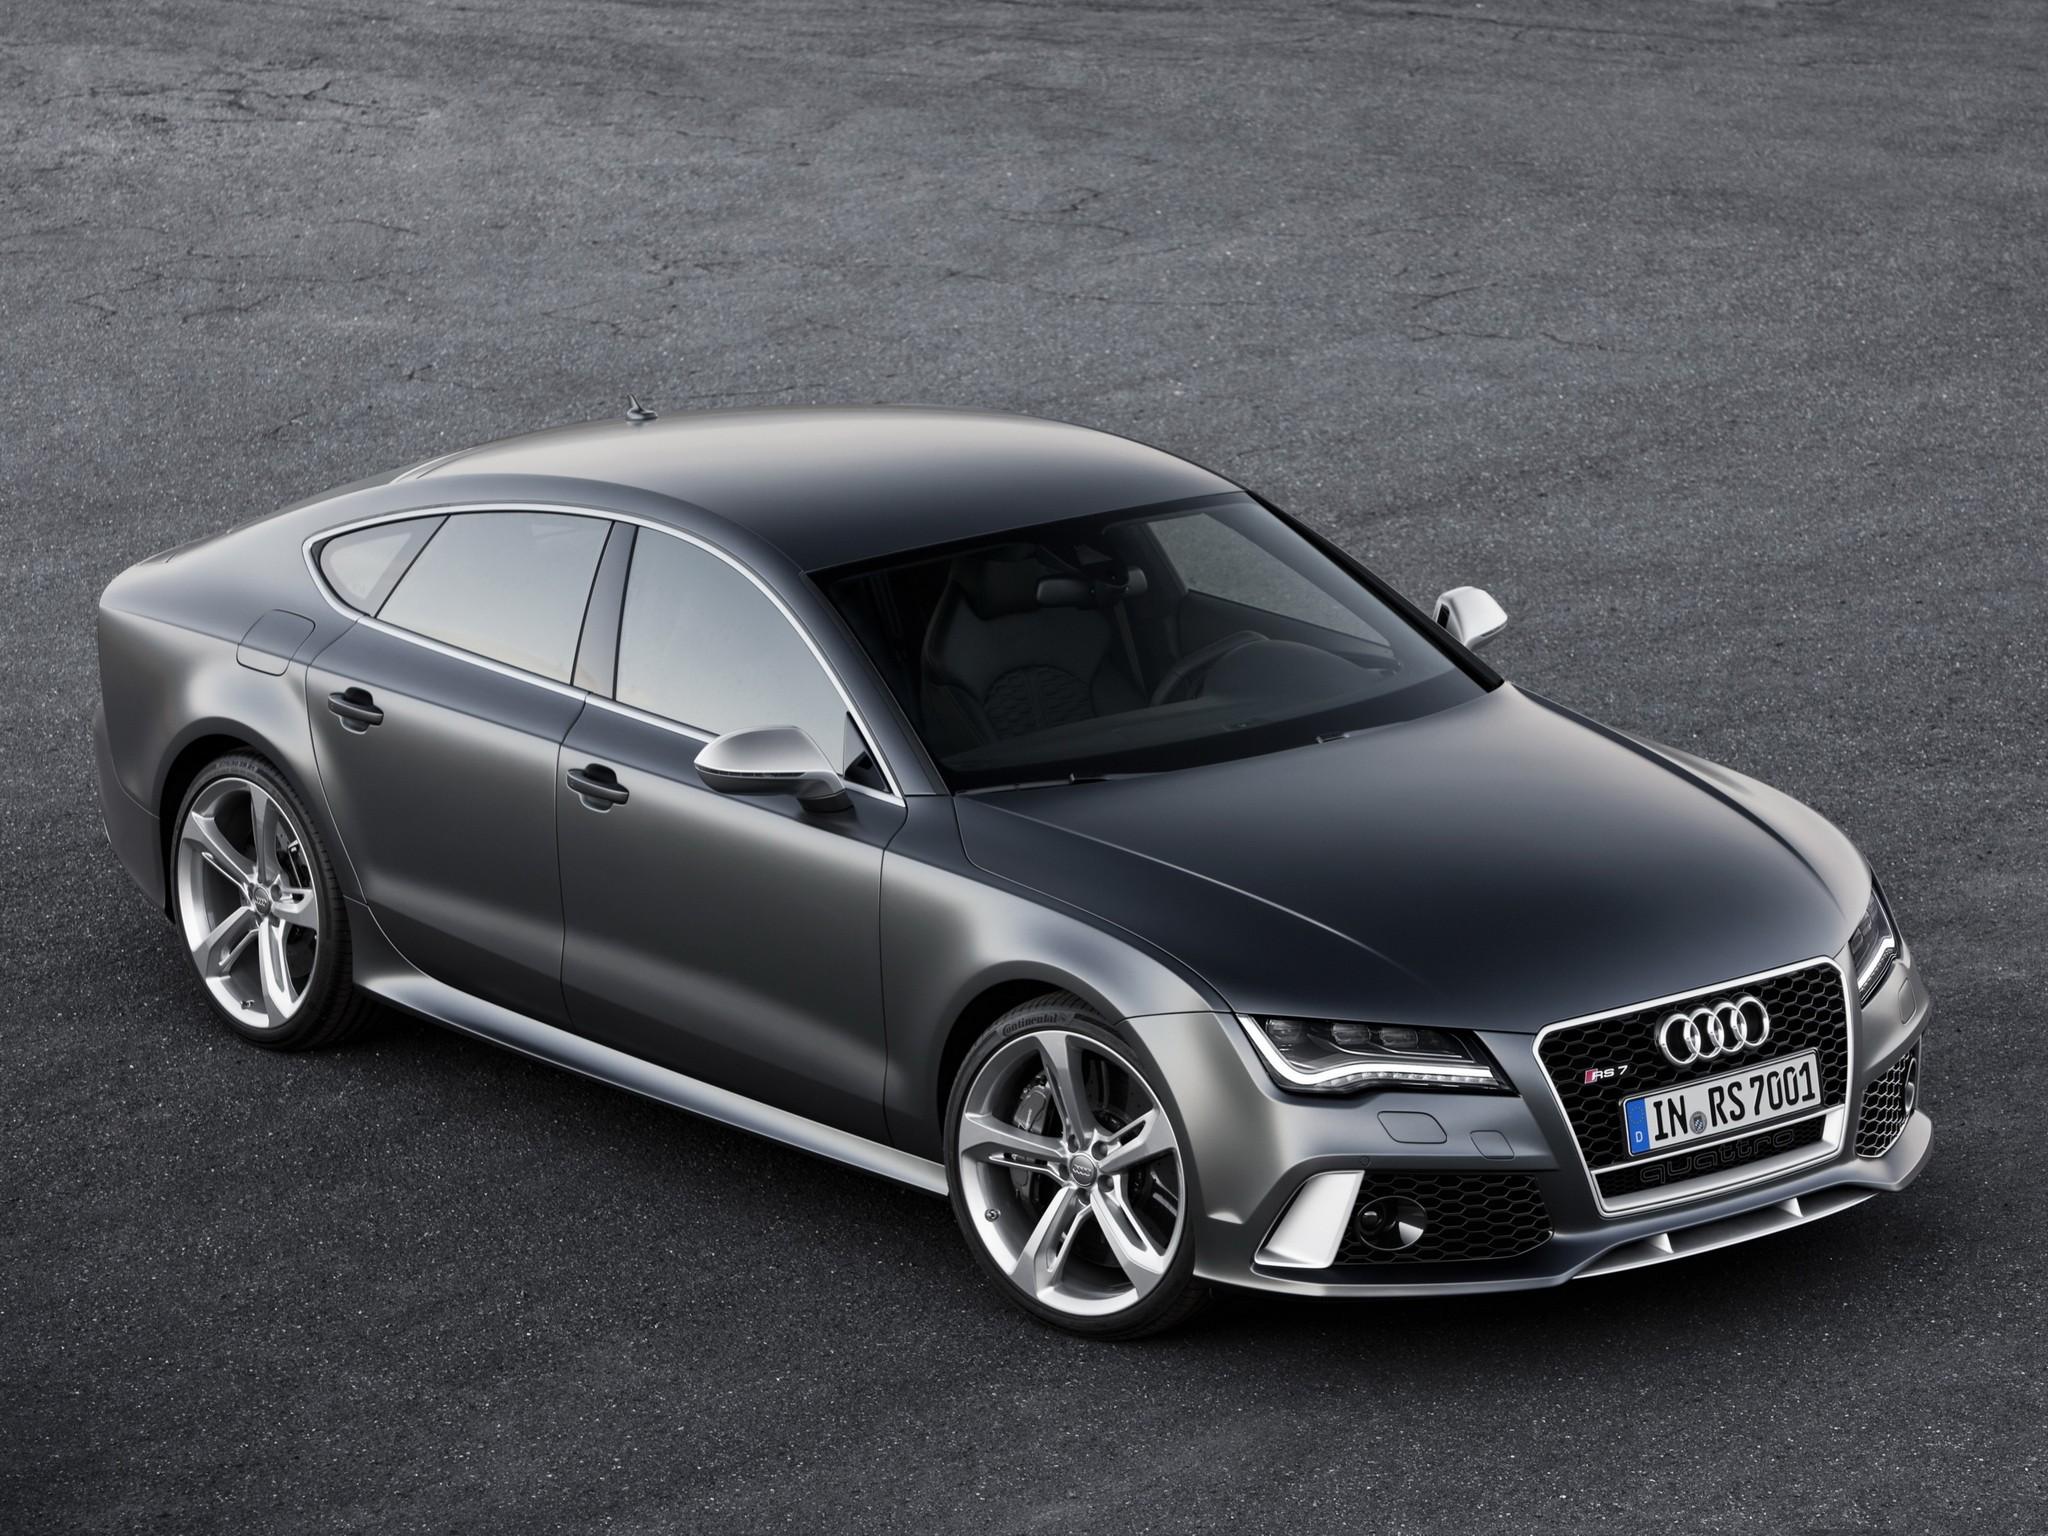 Audi Rs7 Sportback 2013 2014 2015 2016 2017